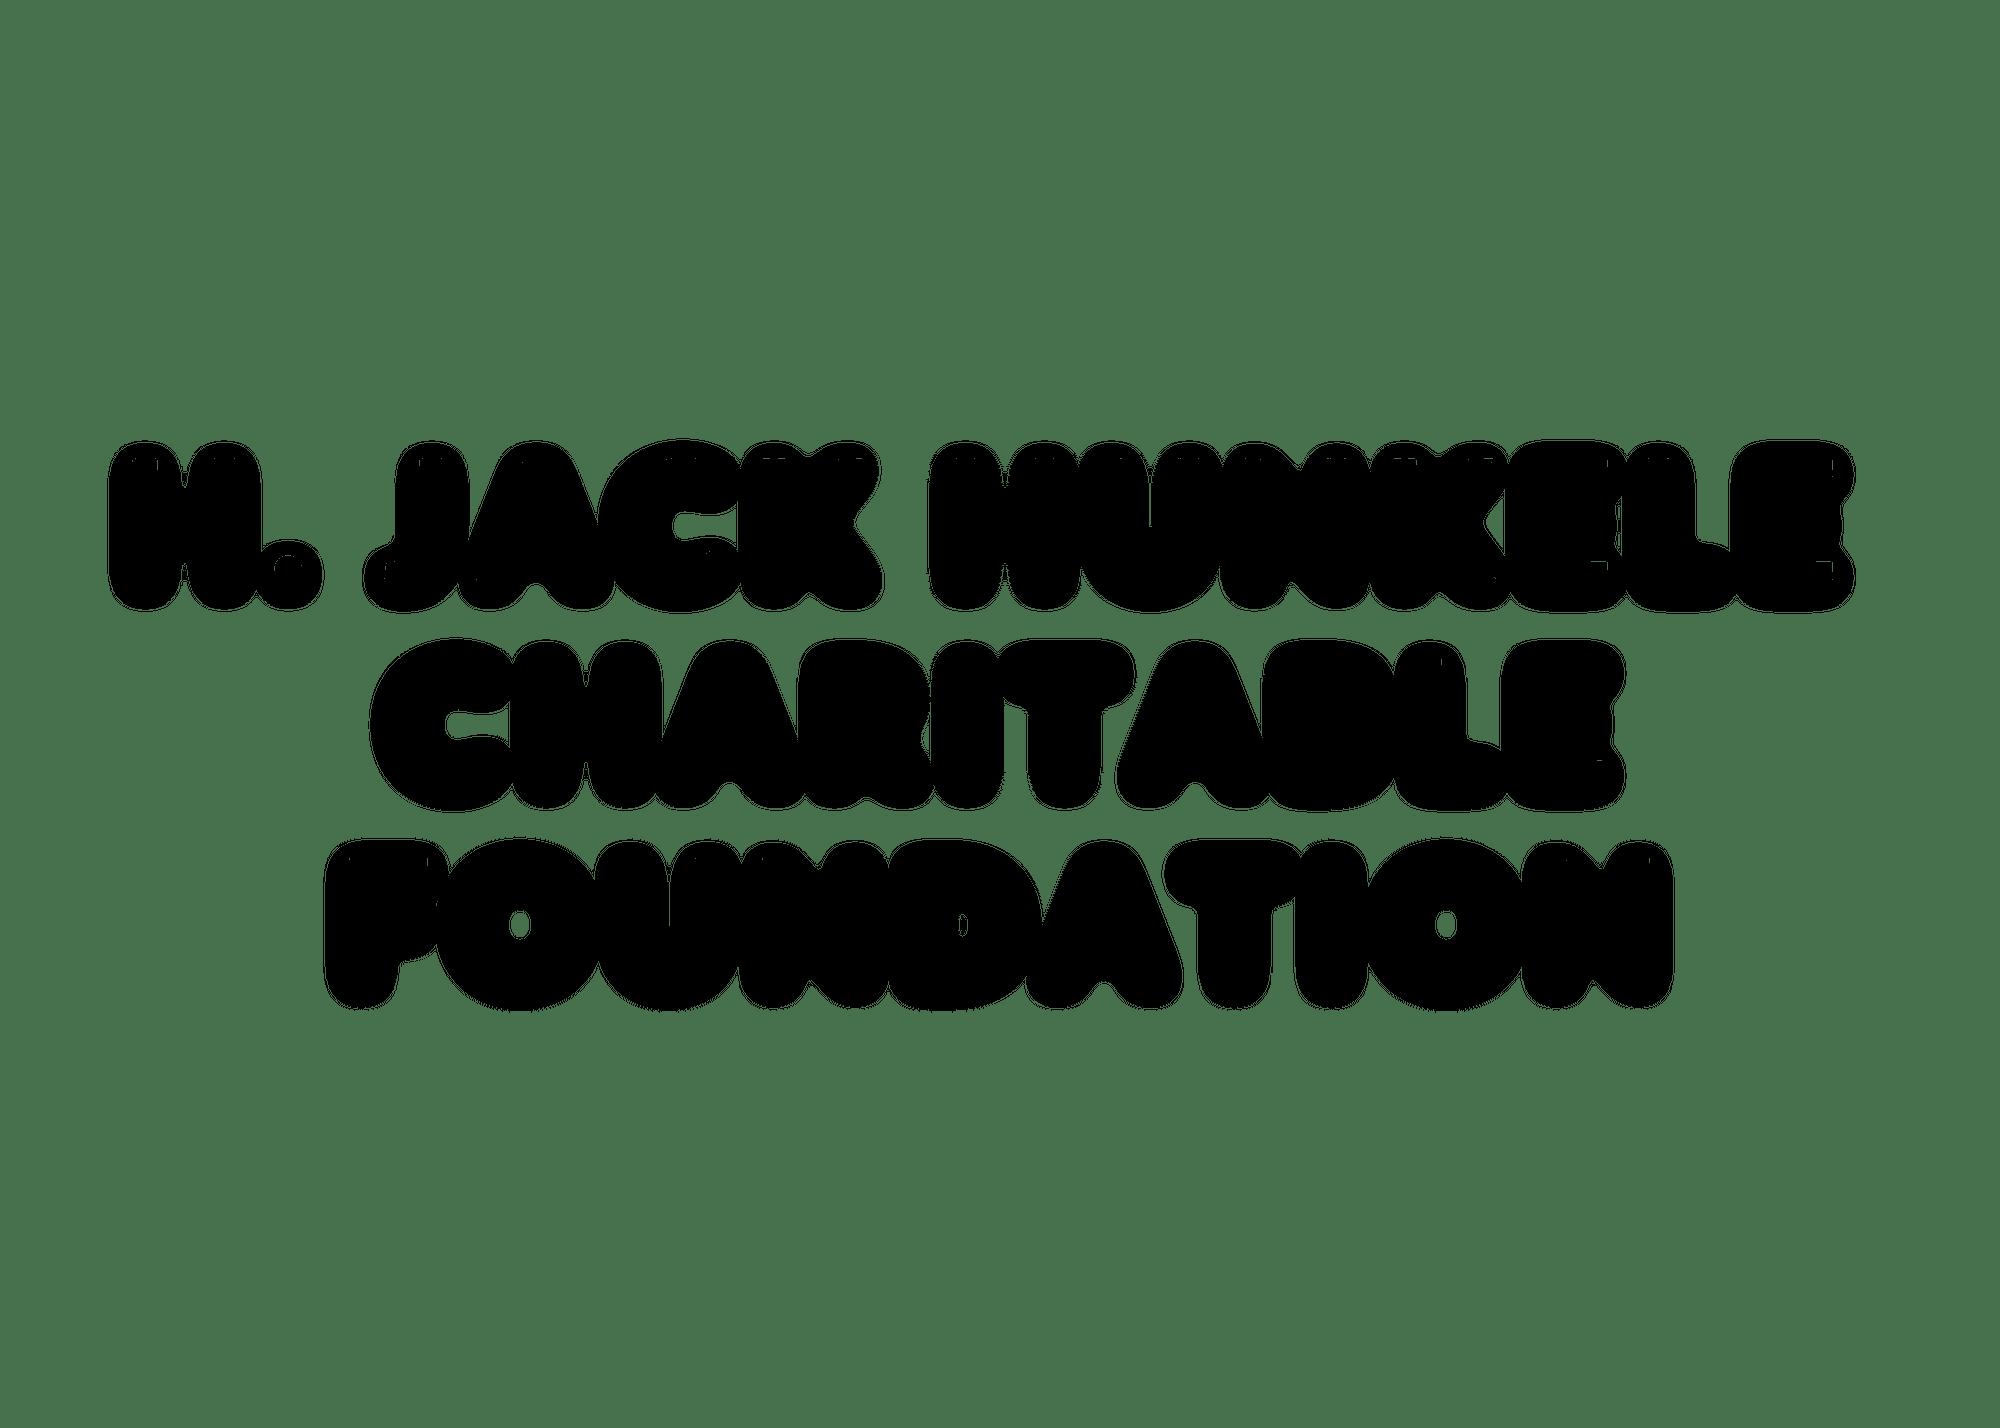 H Jack Hunkele Charitable Foundation name